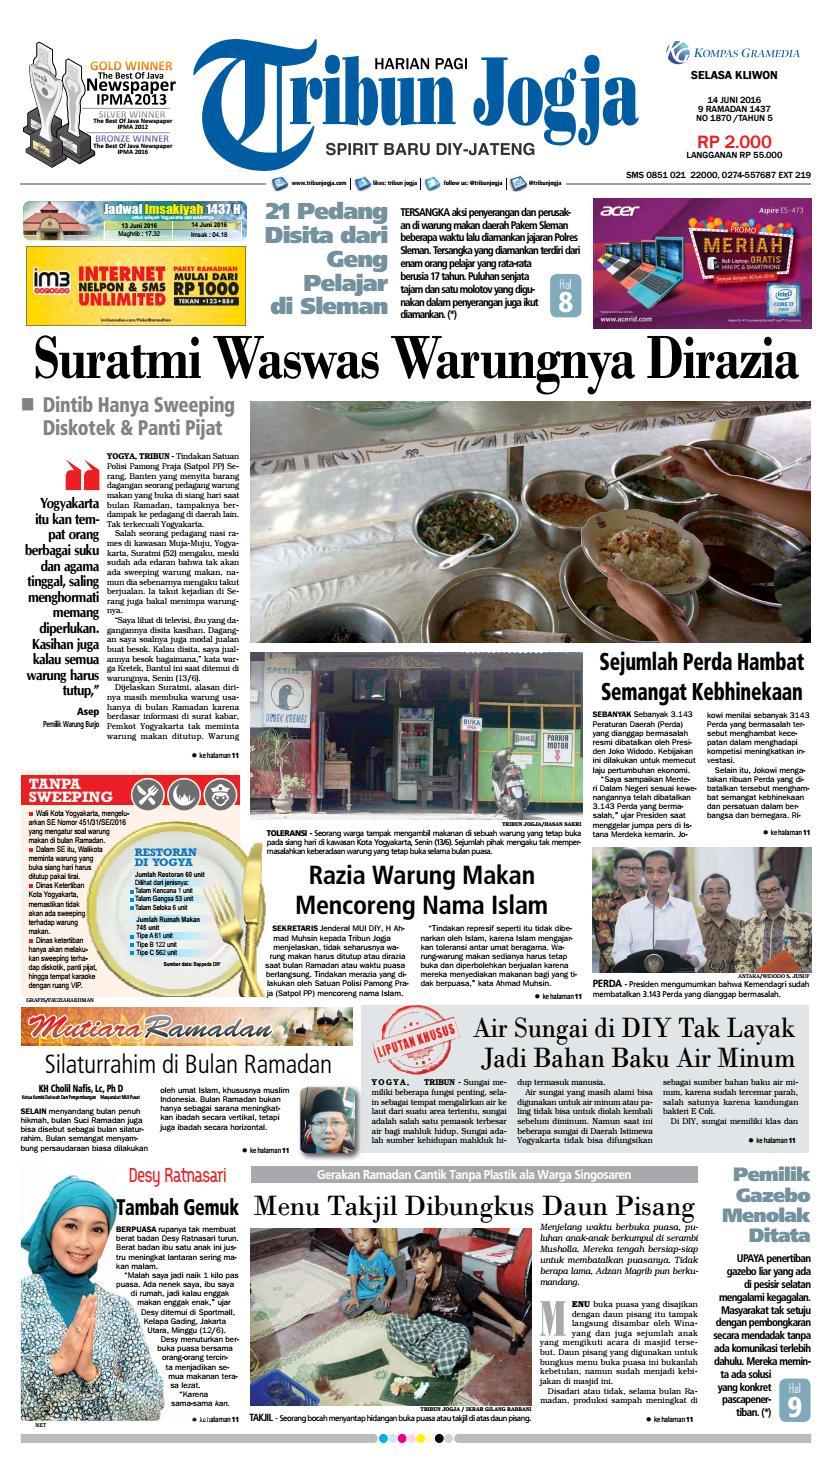 Tribunjogja 18 06 2015 By Tribun Jogja Issuu Produk Ukm Bumn Shifudo Bakso Ikan 500g Free Ongkir Depok Ampamp Jakarta 14 2016